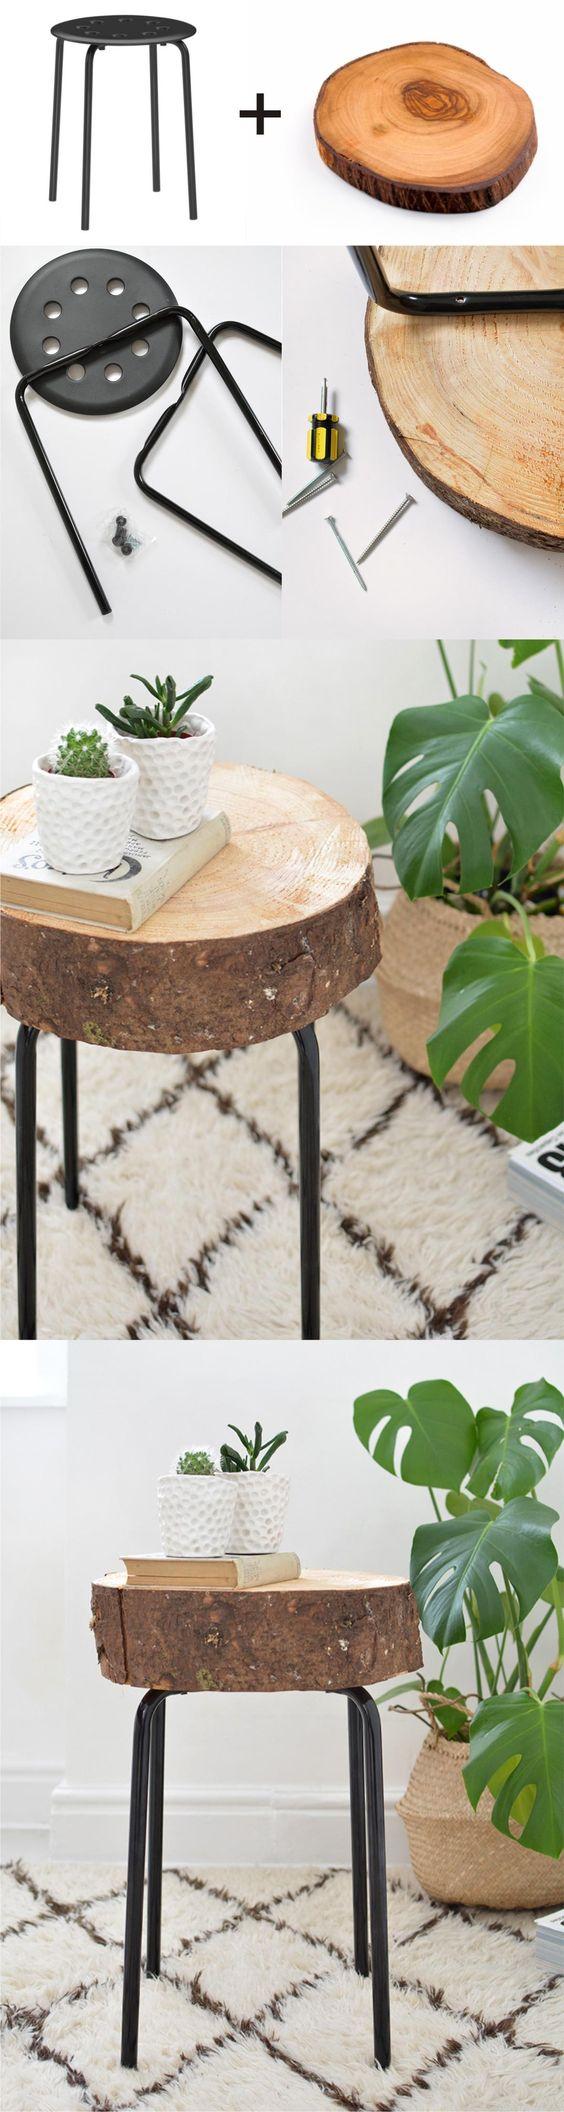 Ikea Hack Wooden Stool.